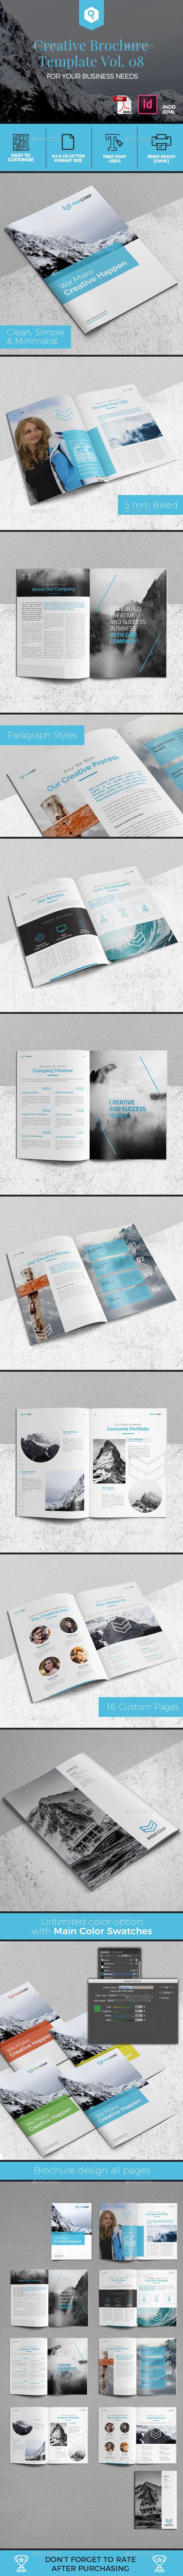 Creative Brochure Template Vol. 08